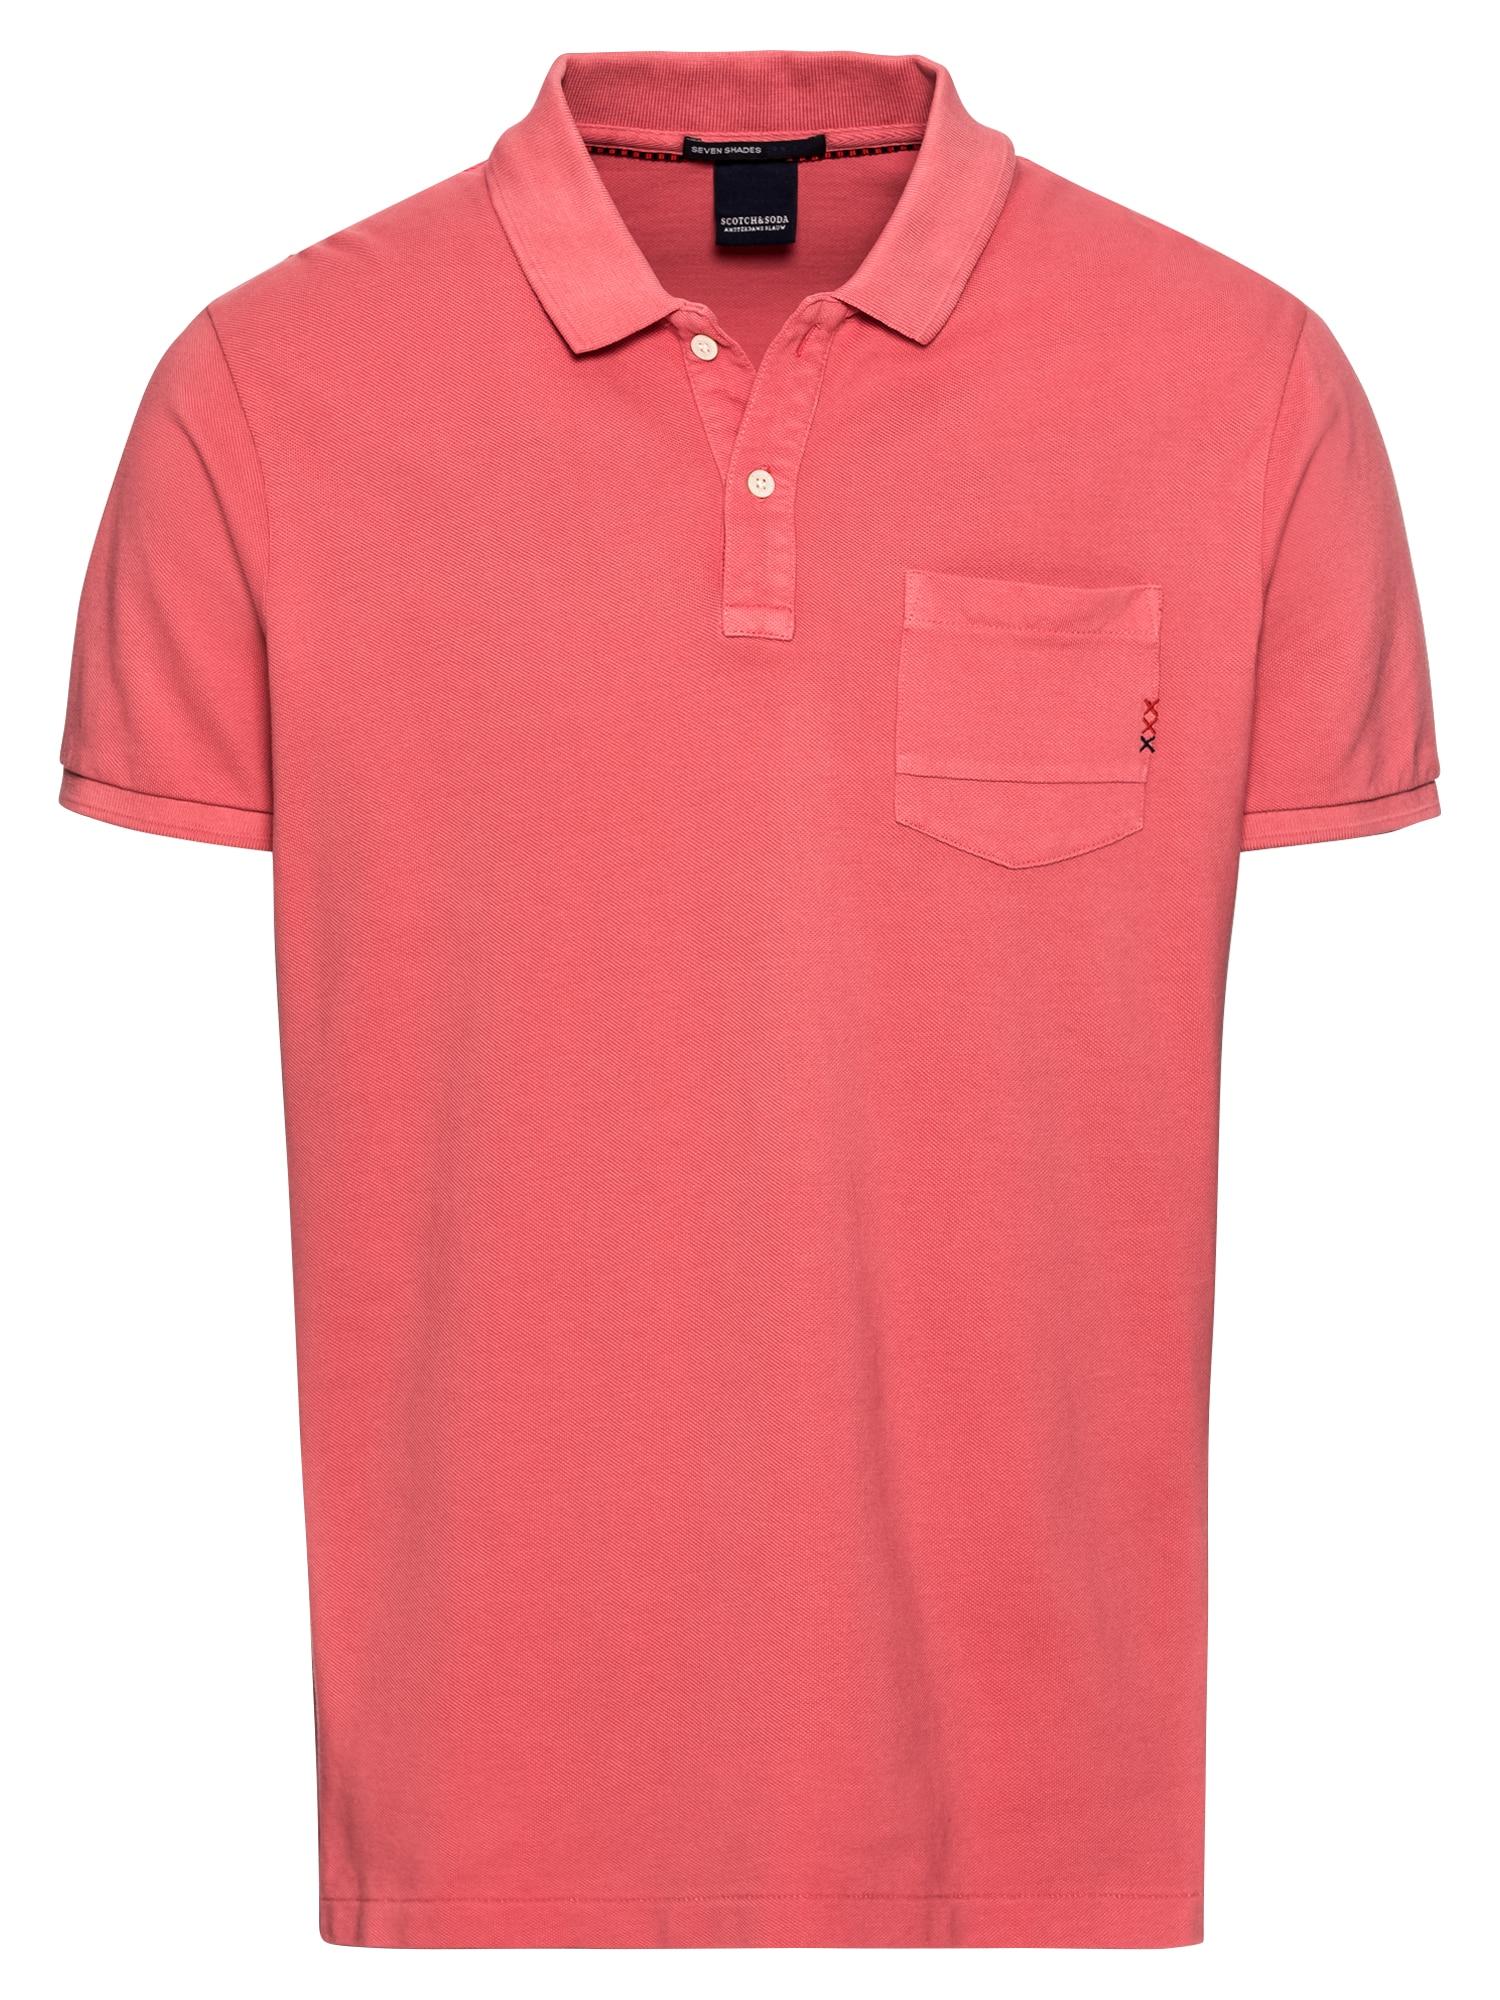 SCOTCH  and  SODA Heren Shirt Ams Blauw garment dyed polo with XXX pocket abriko